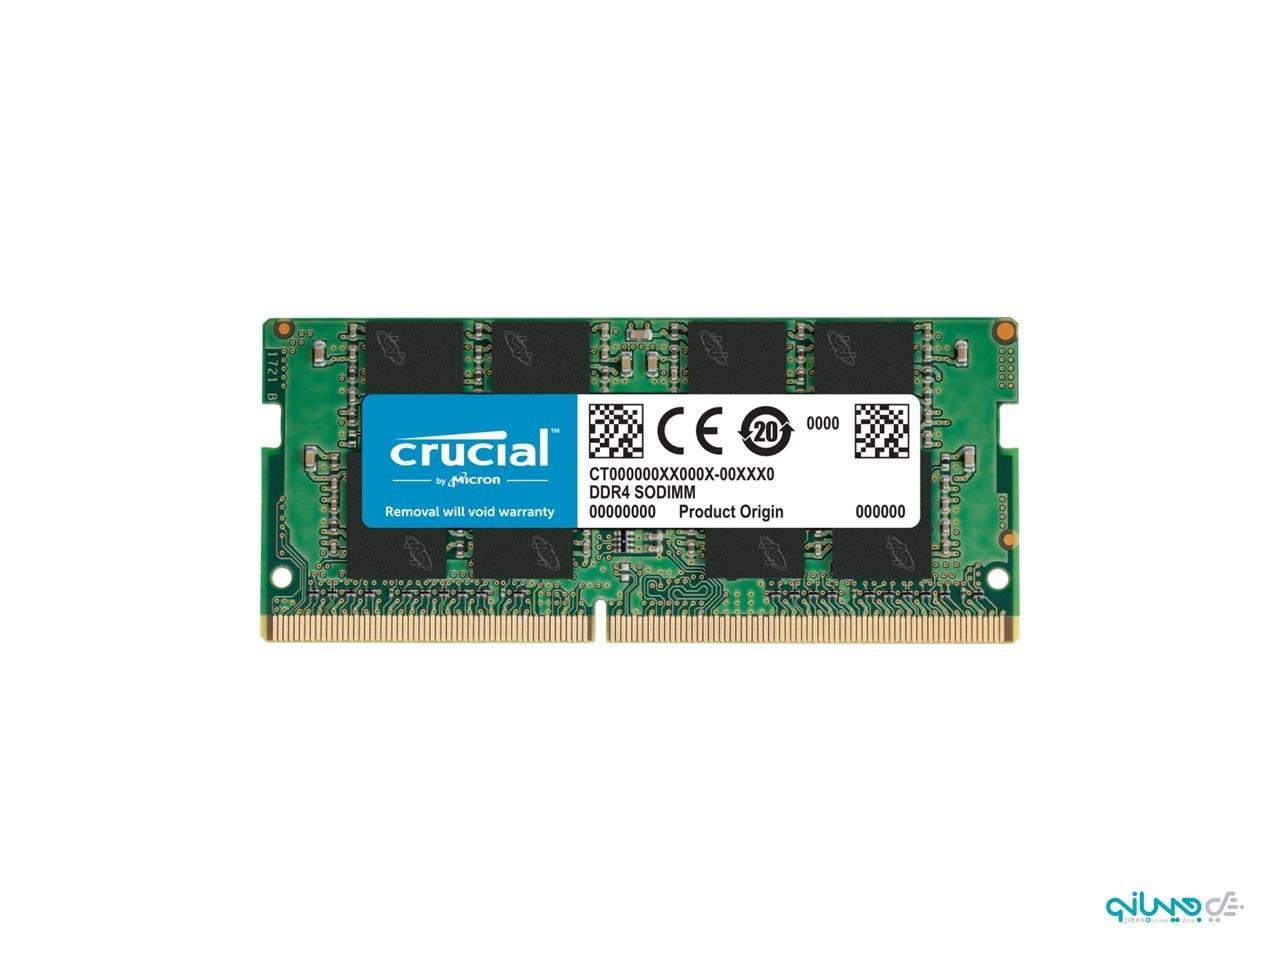 عکس رم لپ تاپ DDR4 تک کاناله 2666 مگاهرتز CL19 کروشیال ظرفیت 4 گیگابایت  رم-لپ-تاپ-ddr4-تک-کاناله-2666-مگاهرتز-cl19-کروشیال-ظرفیت-4-گیگابایت